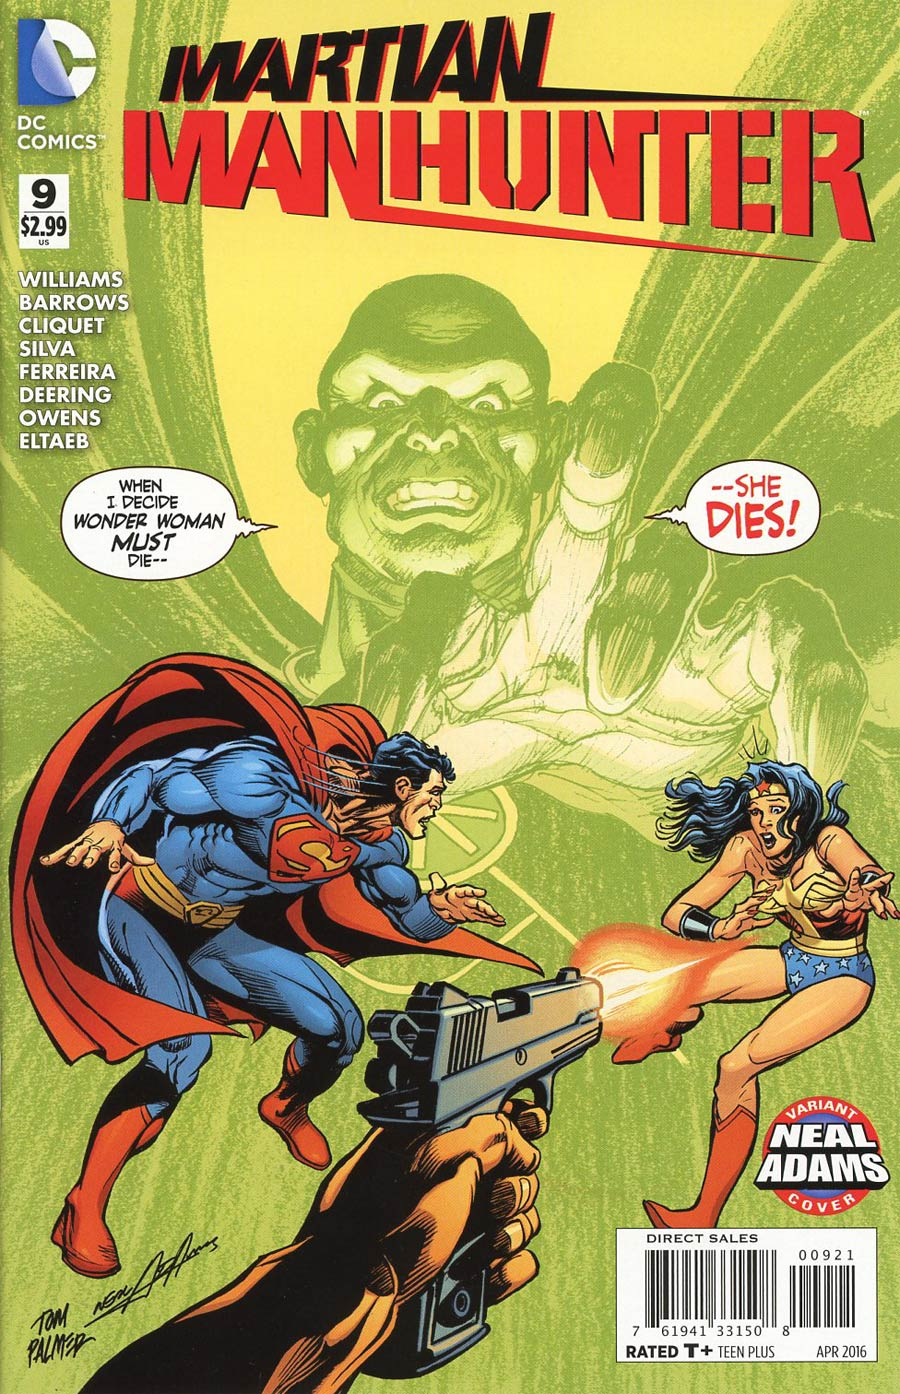 Martian Manhunter Vol 4 #9 Cover B Variant Neal Adams Cover